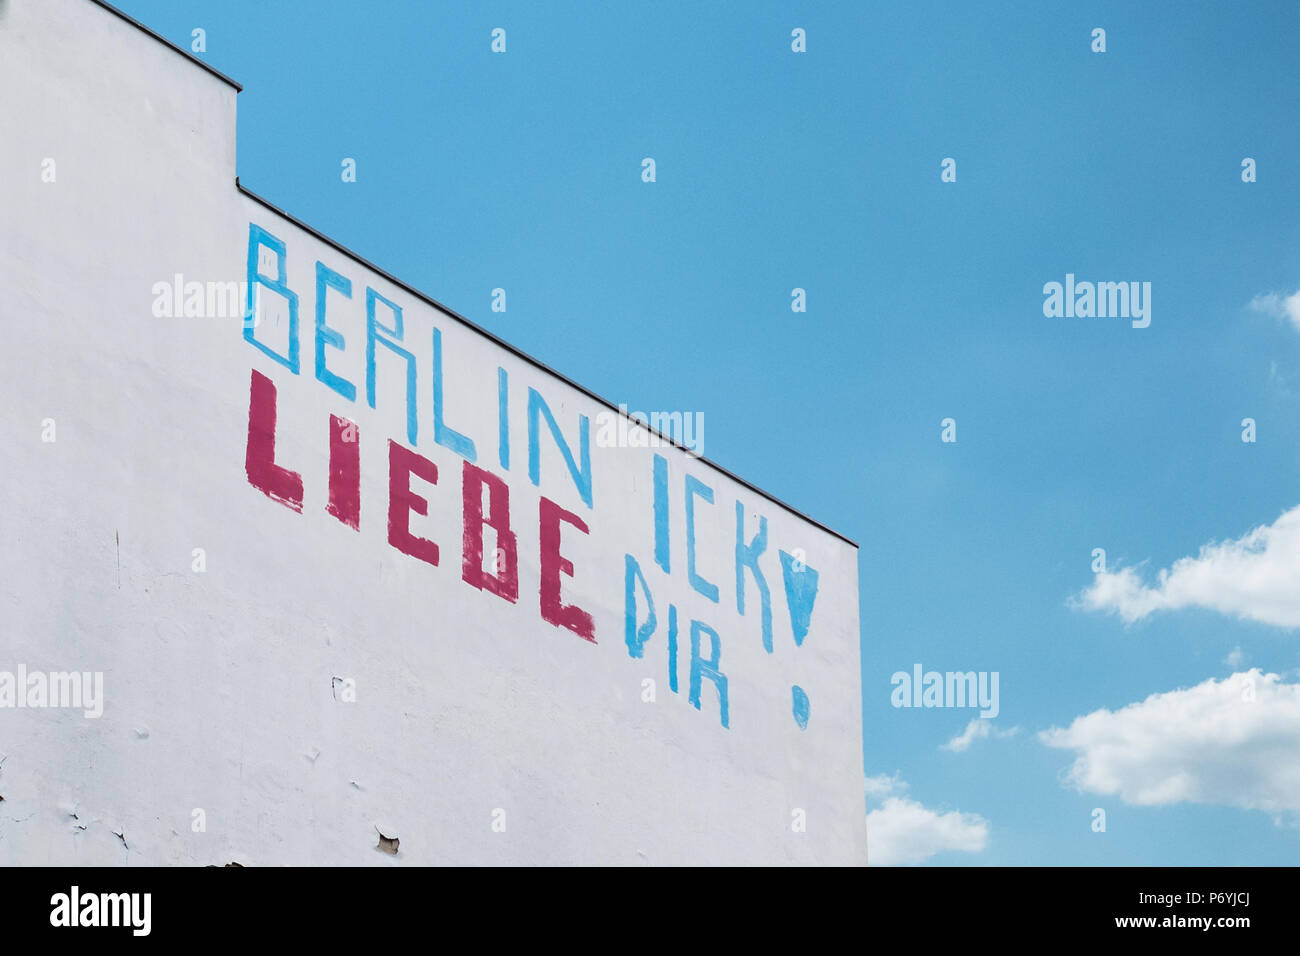 BErlin, Germany - june 2018: Graffiti slogan on building facade saying: Berlin, I love you (german: Berlin Ick liebe Dir) - Stock Image